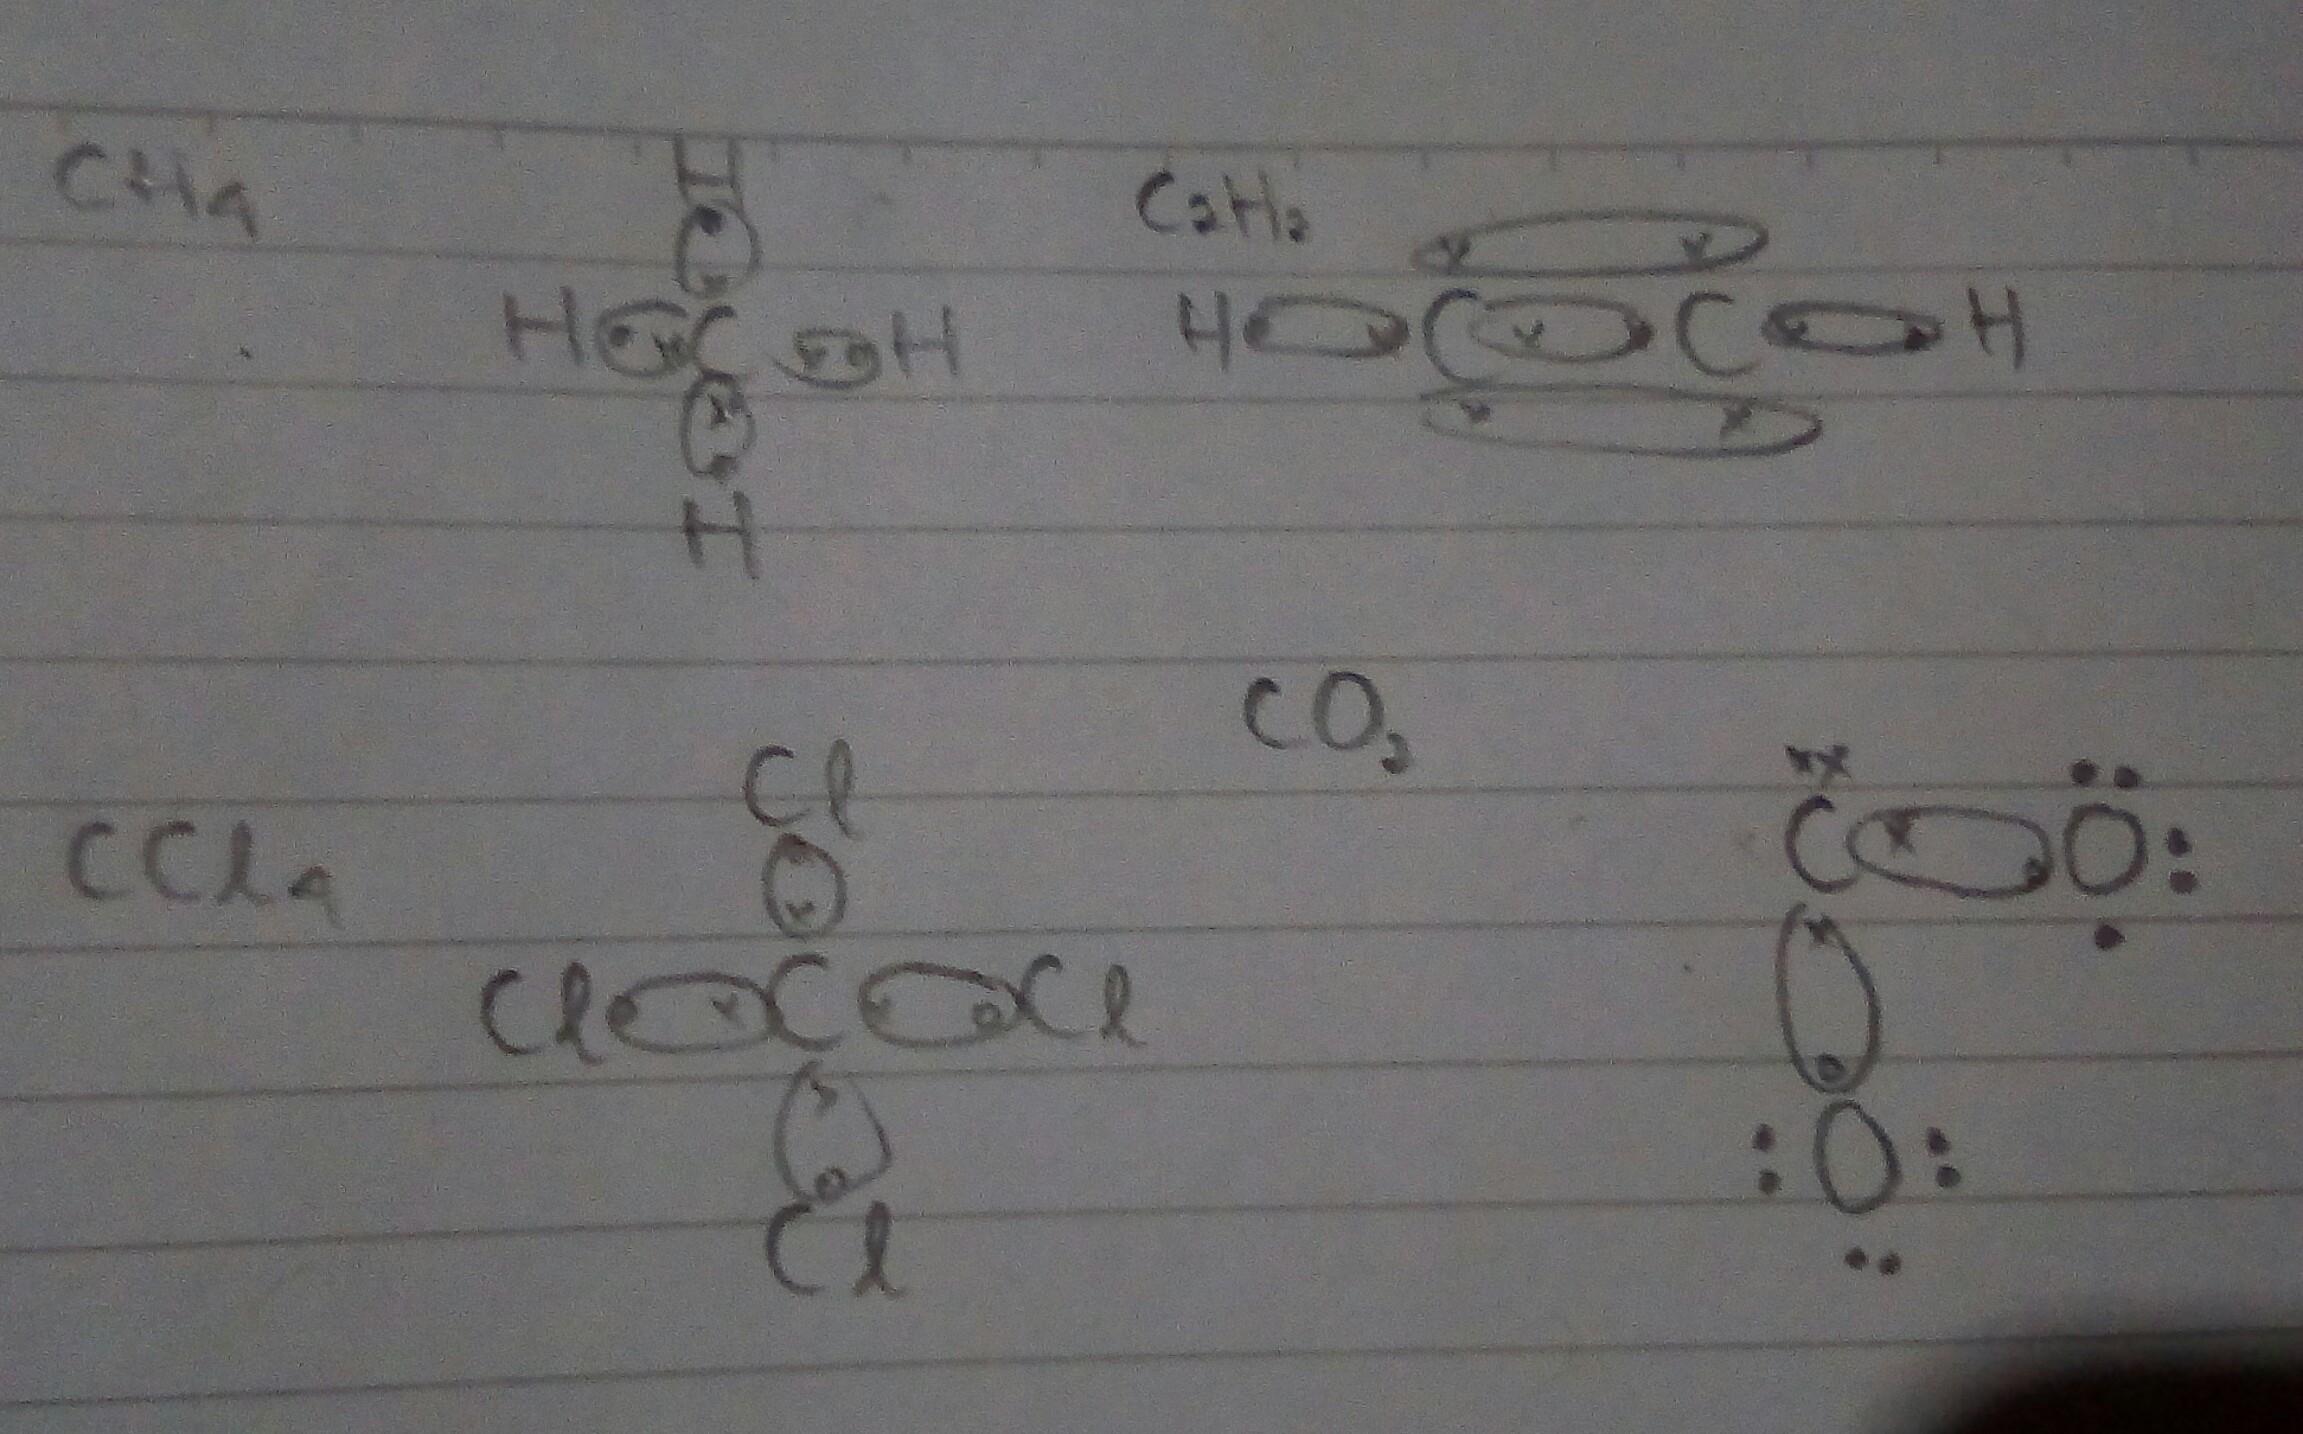 Ch4 Ccl4 C2h2 Co2 Kenapa Disebut Senyawa Non Polar Padahal Ada Unsur Yang Memiliki Jelaskan Brainly Co Id